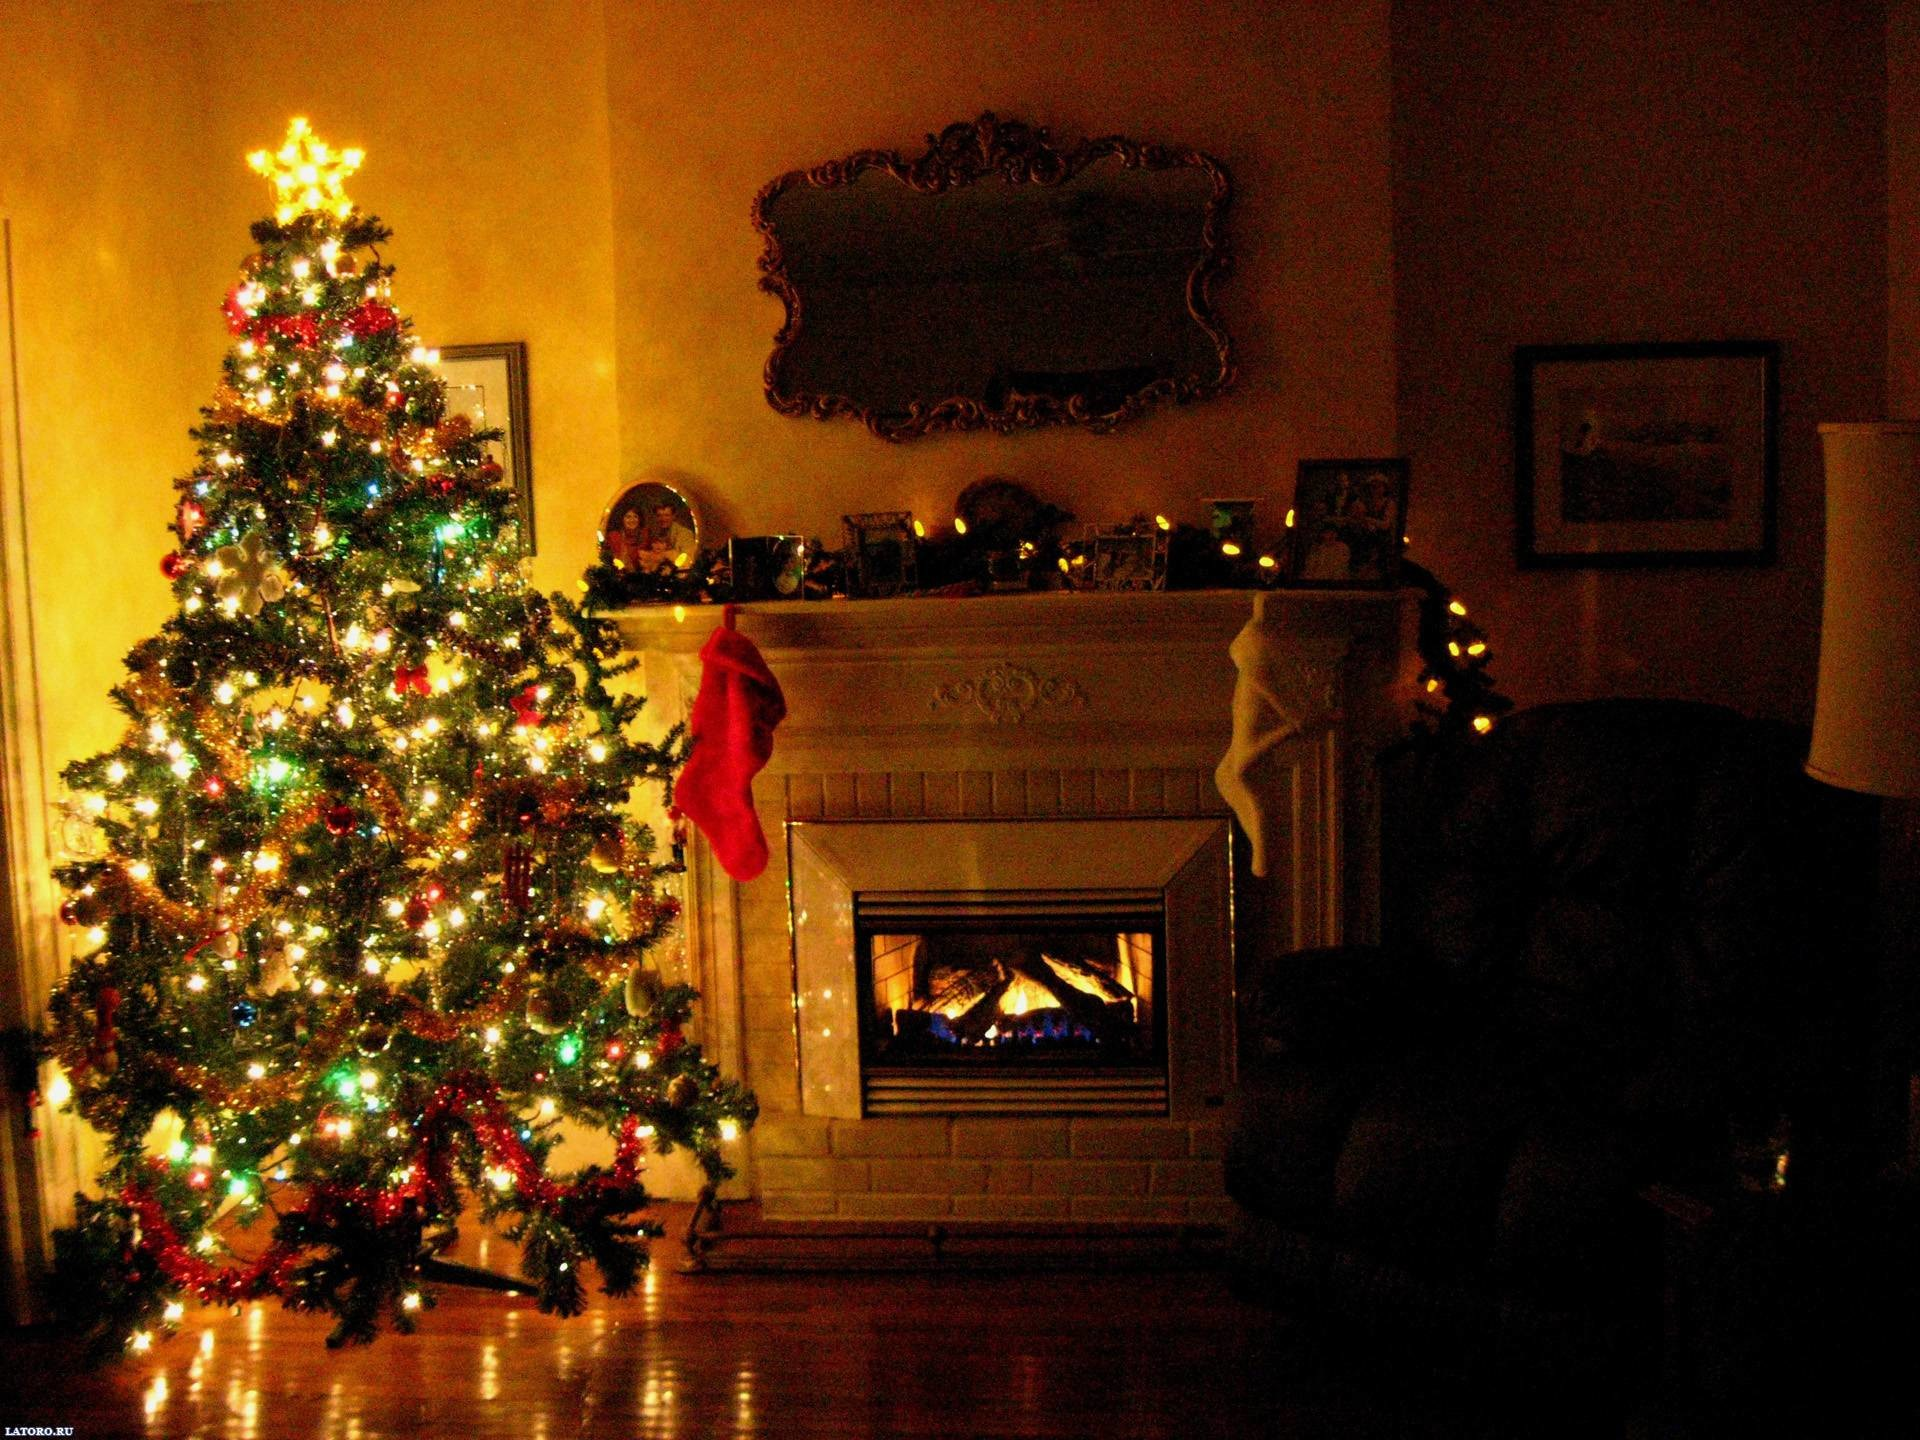 Free Christmas Desktop Wallpapers Backgrounds | Wallpapers9